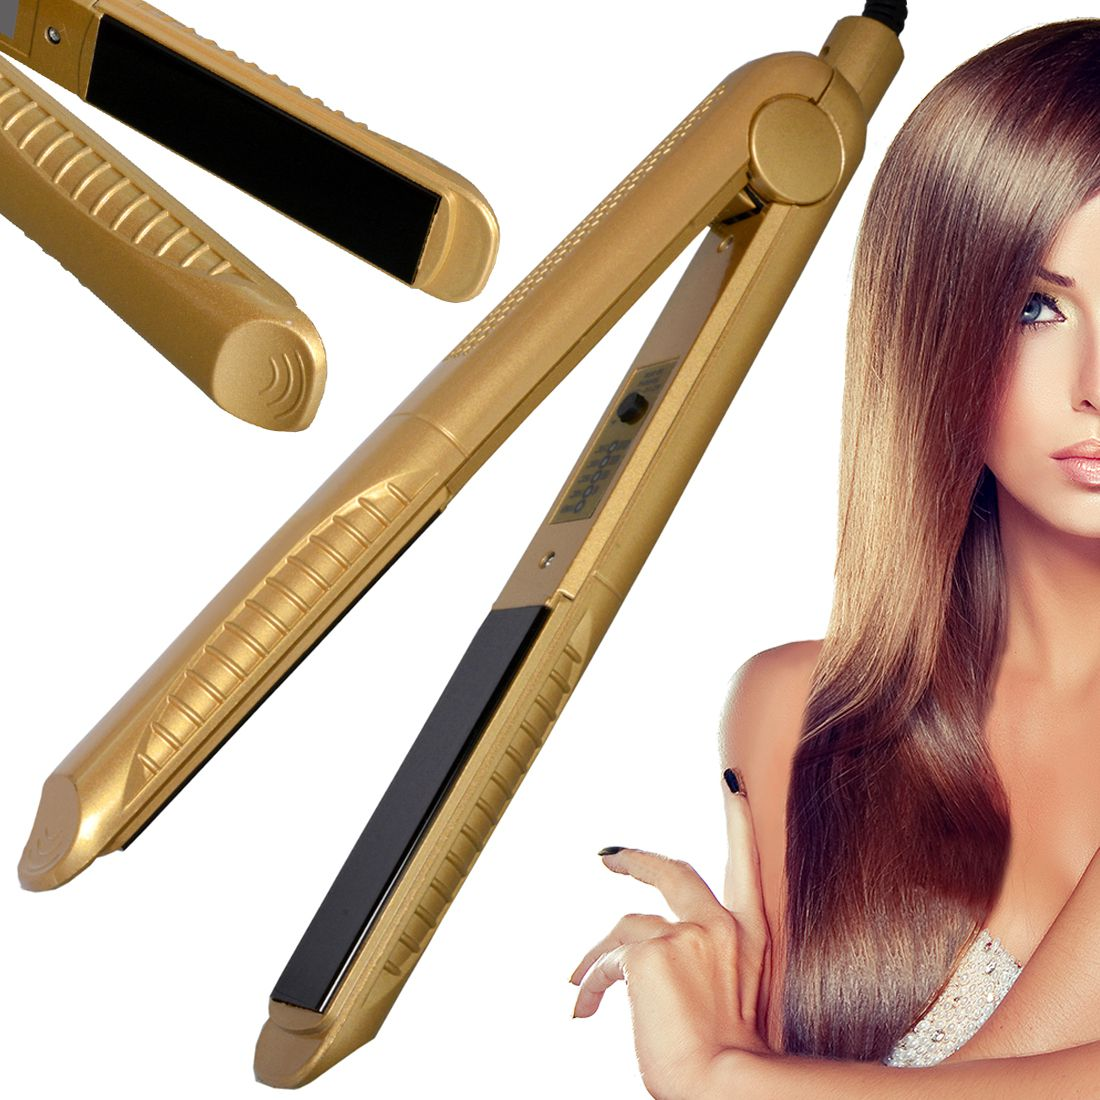 SJ Temperature Control Flat Iron Professional Travel Hair Straighteners 45W Hair Straightener ( Golden )